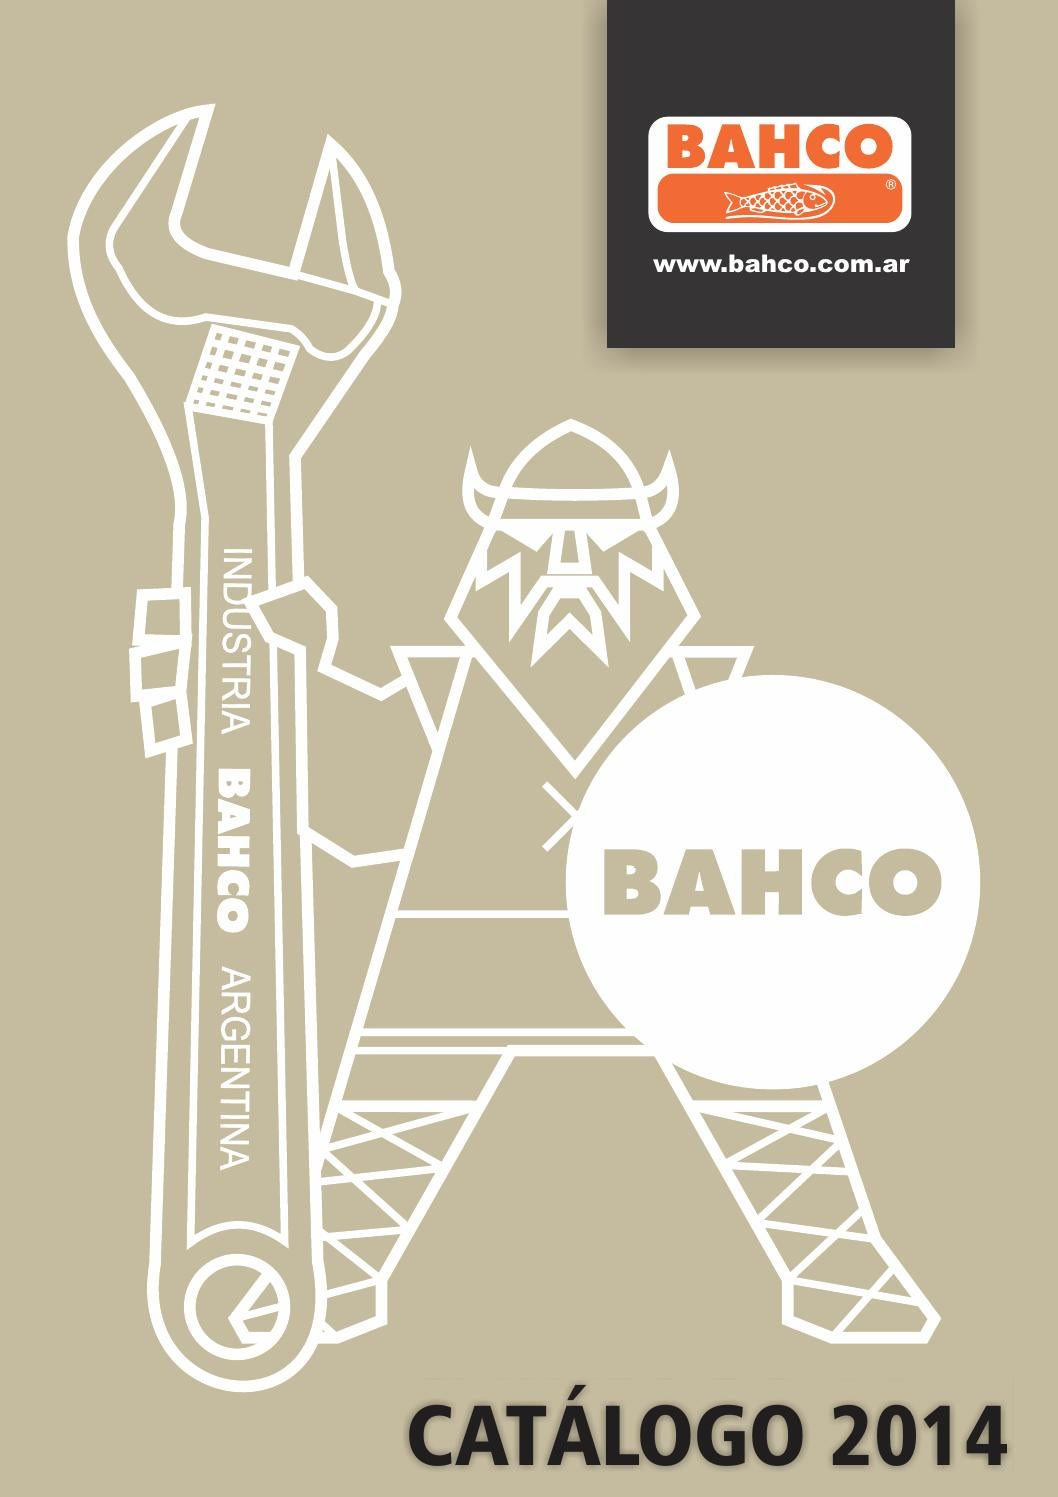 8 mm Drive Bahco 28MV-8 LLAVE TUBO AISLADA 8